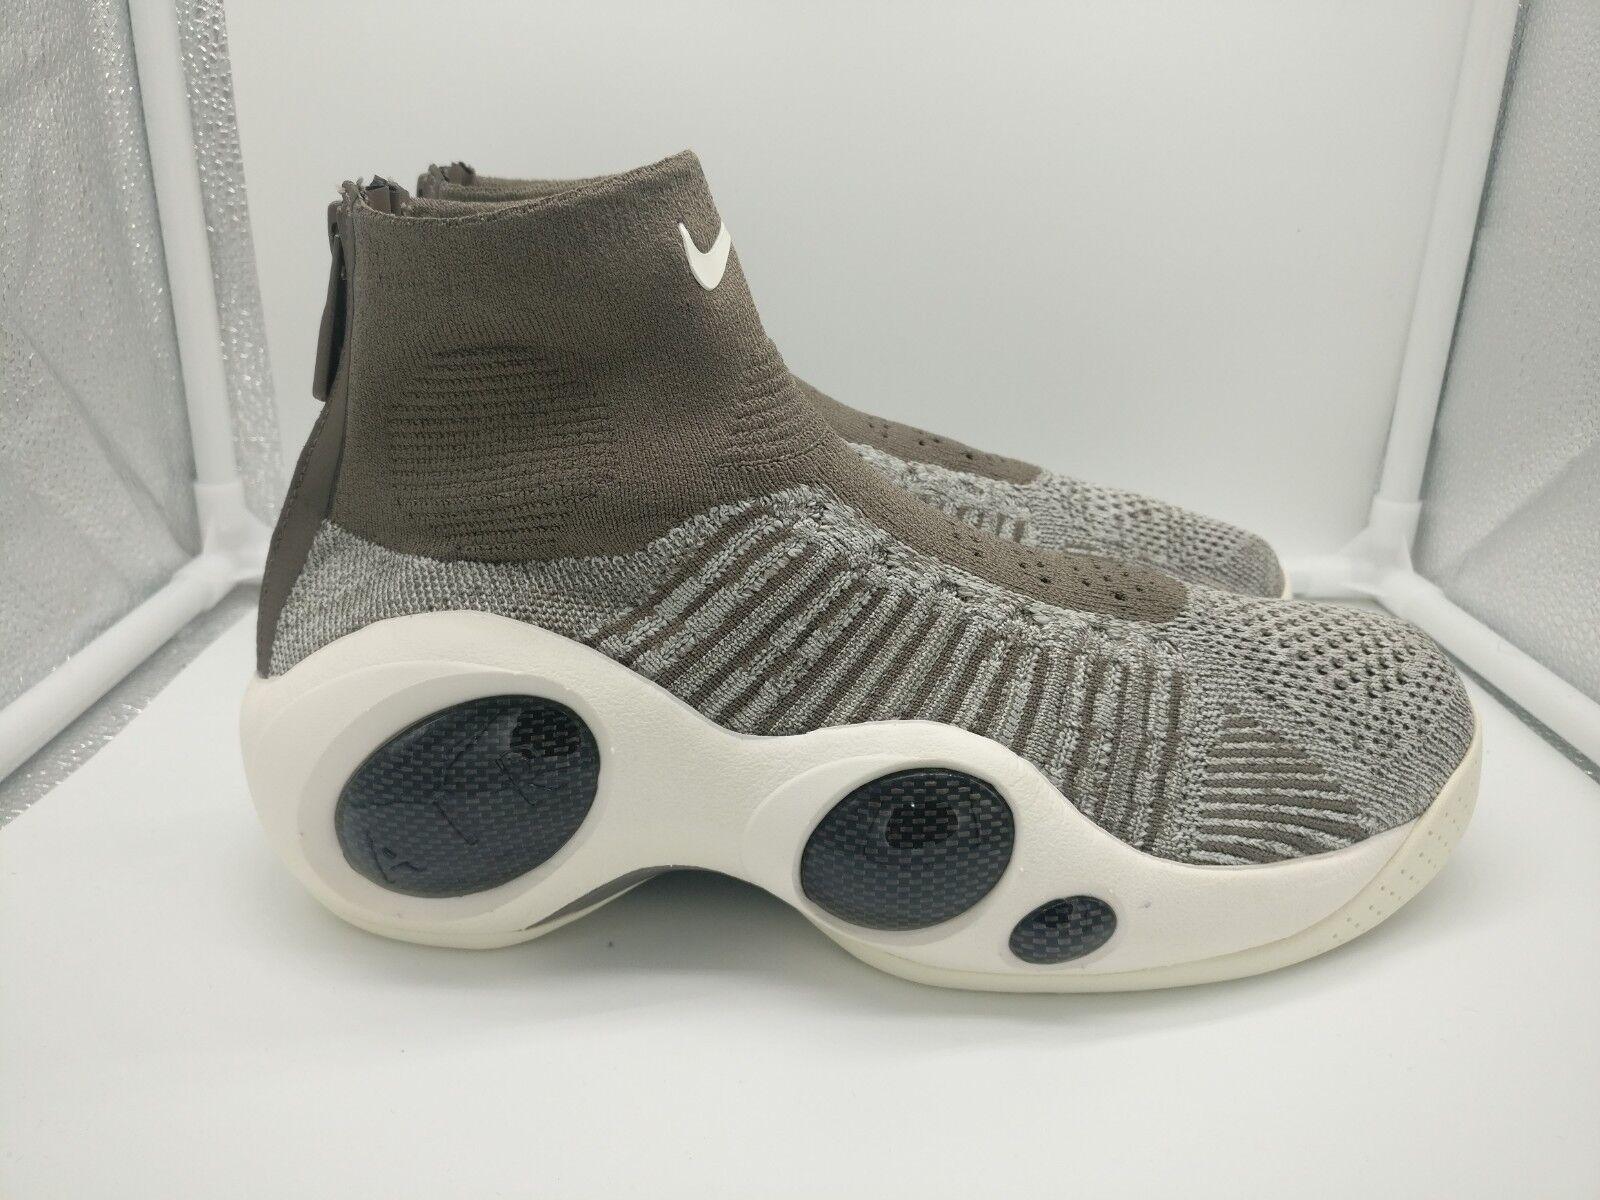 Nike Flight Bonafide UK 7.5 oscuro hongo gris pálido Vela 917742-201